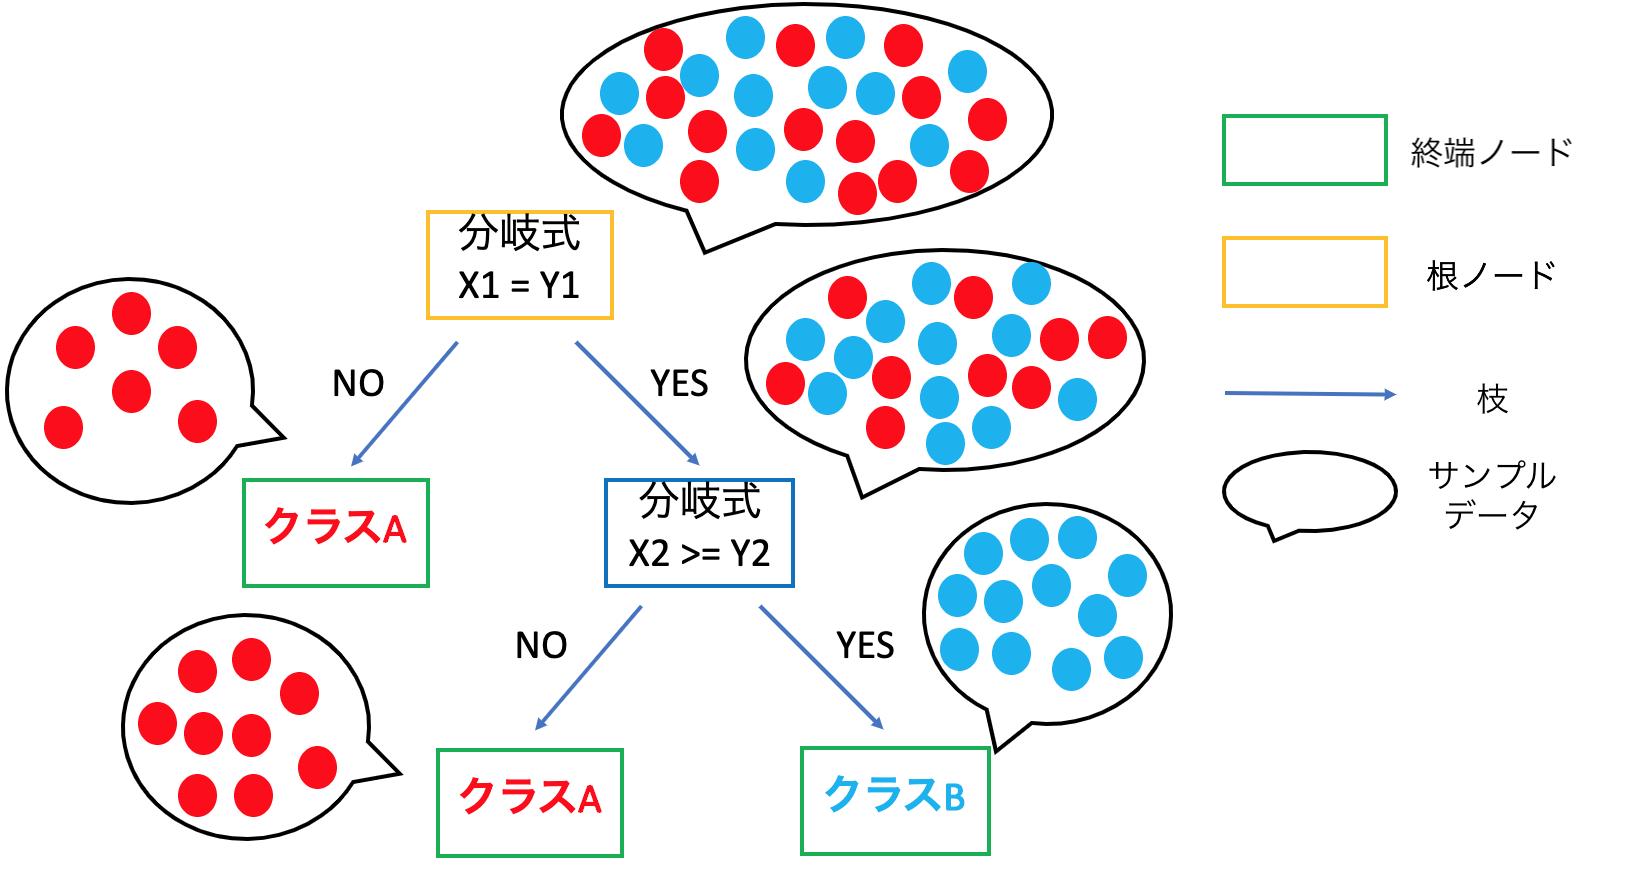 Decision_tree_model_ja.png